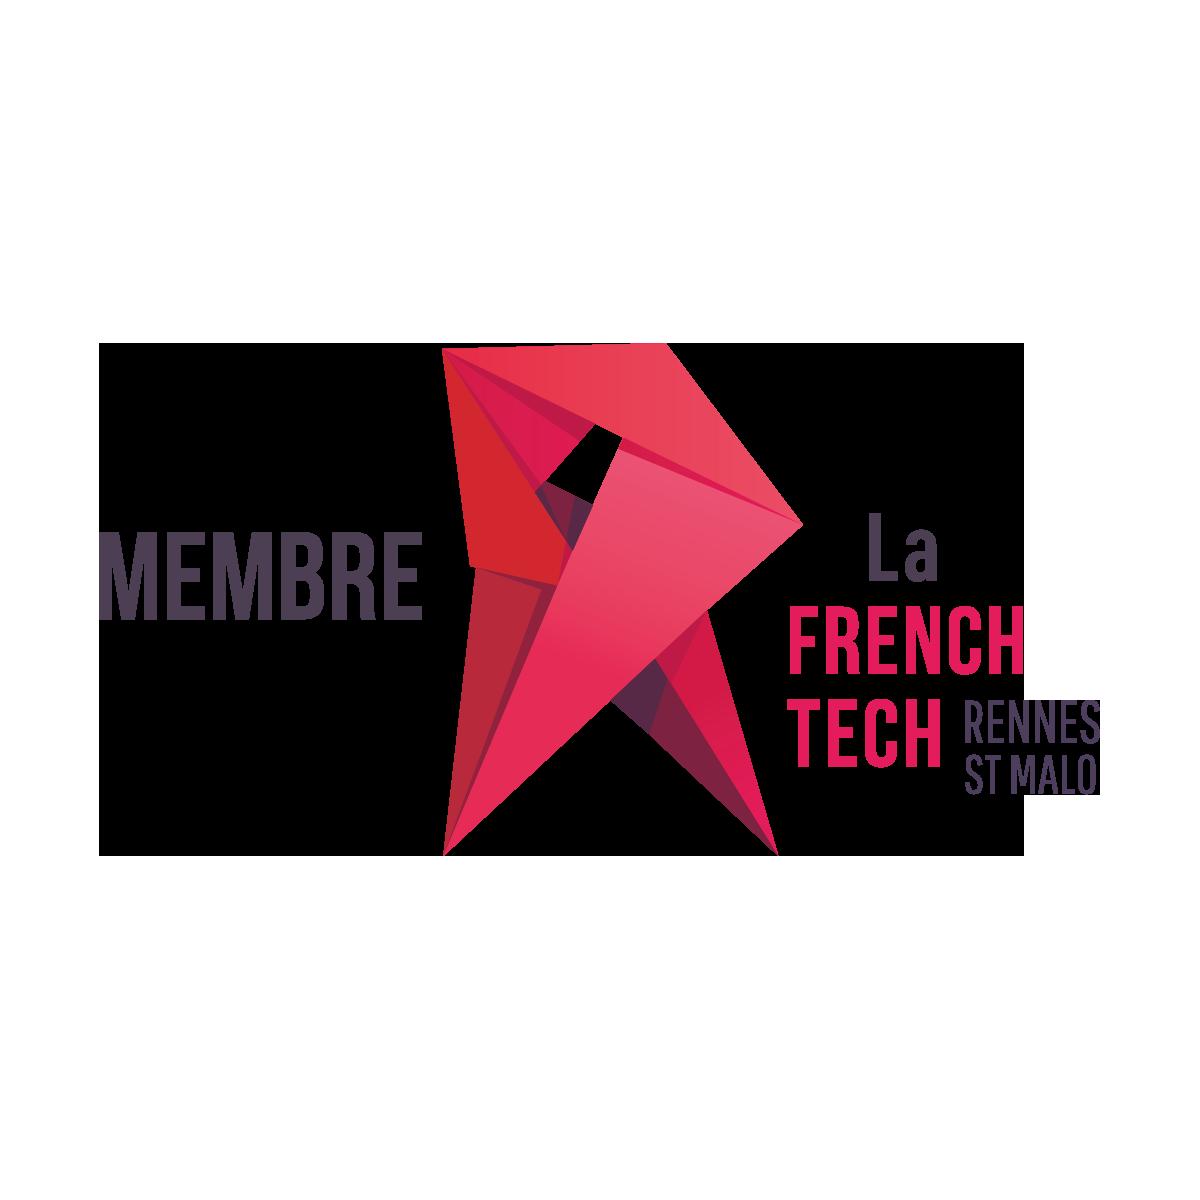 French tech organization